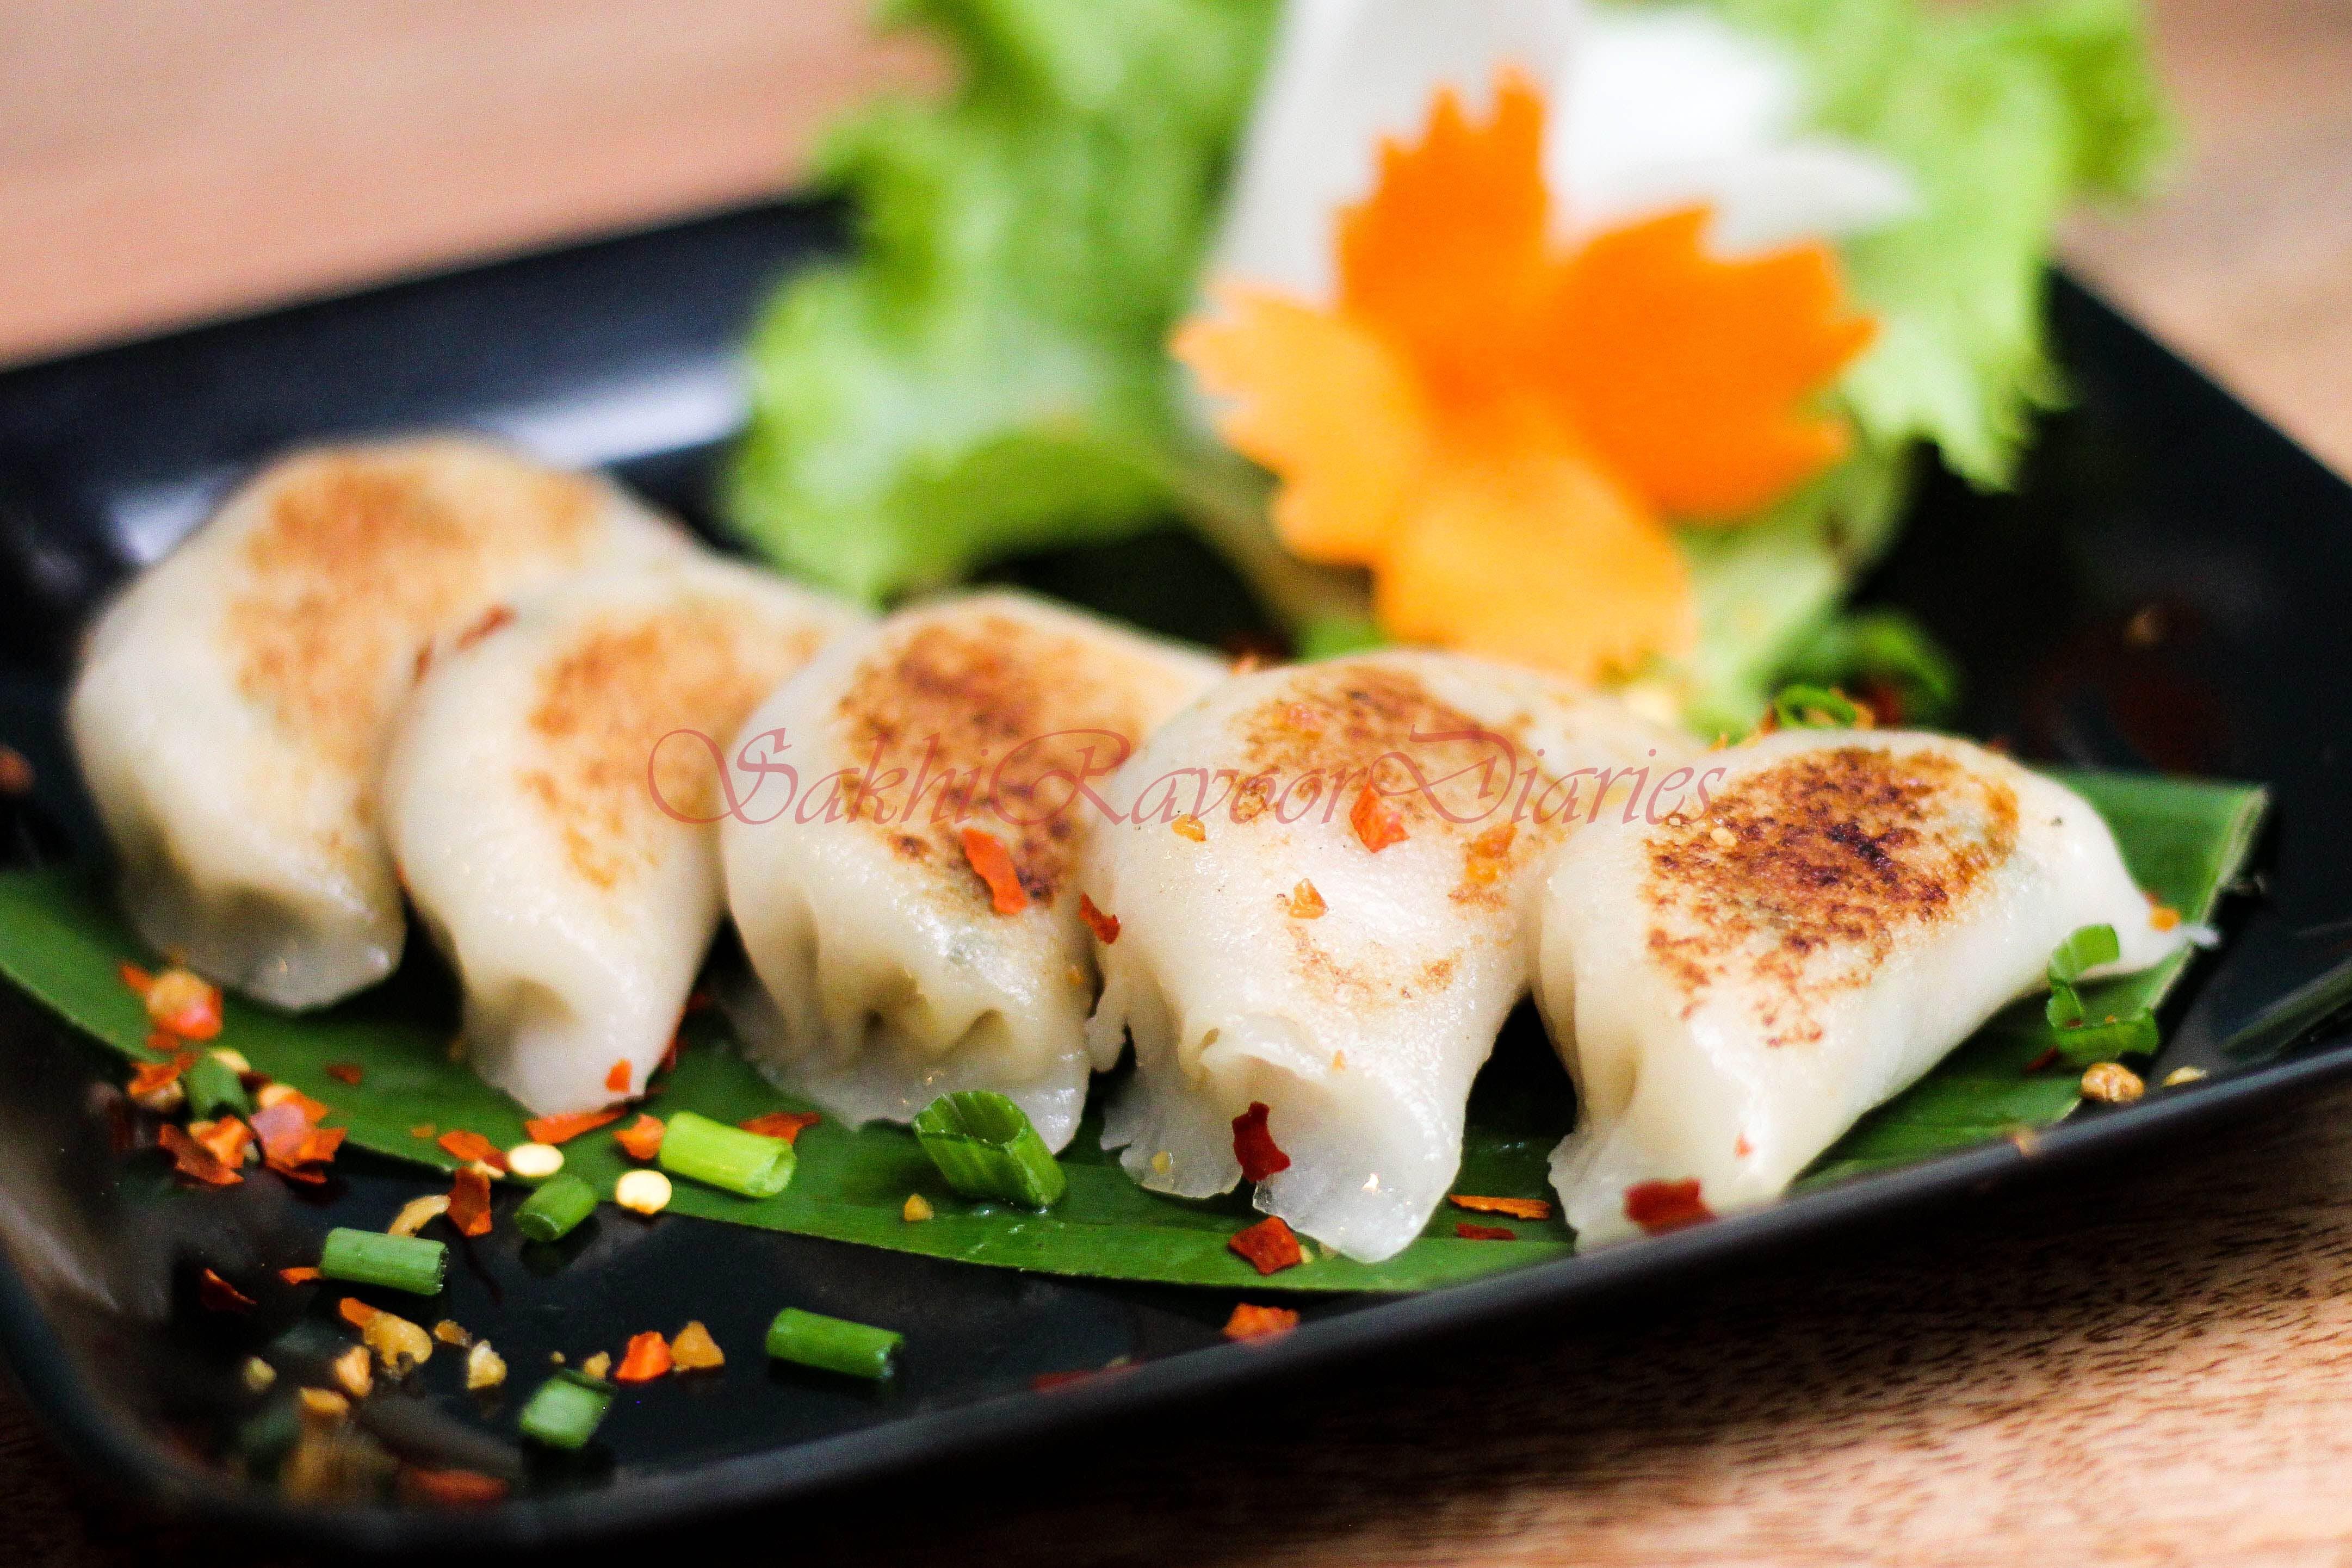 Dish,Food,Cuisine,Ingredient,Comfort food,Produce,À la carte food,Recipe,Garnish,Bánh ướt